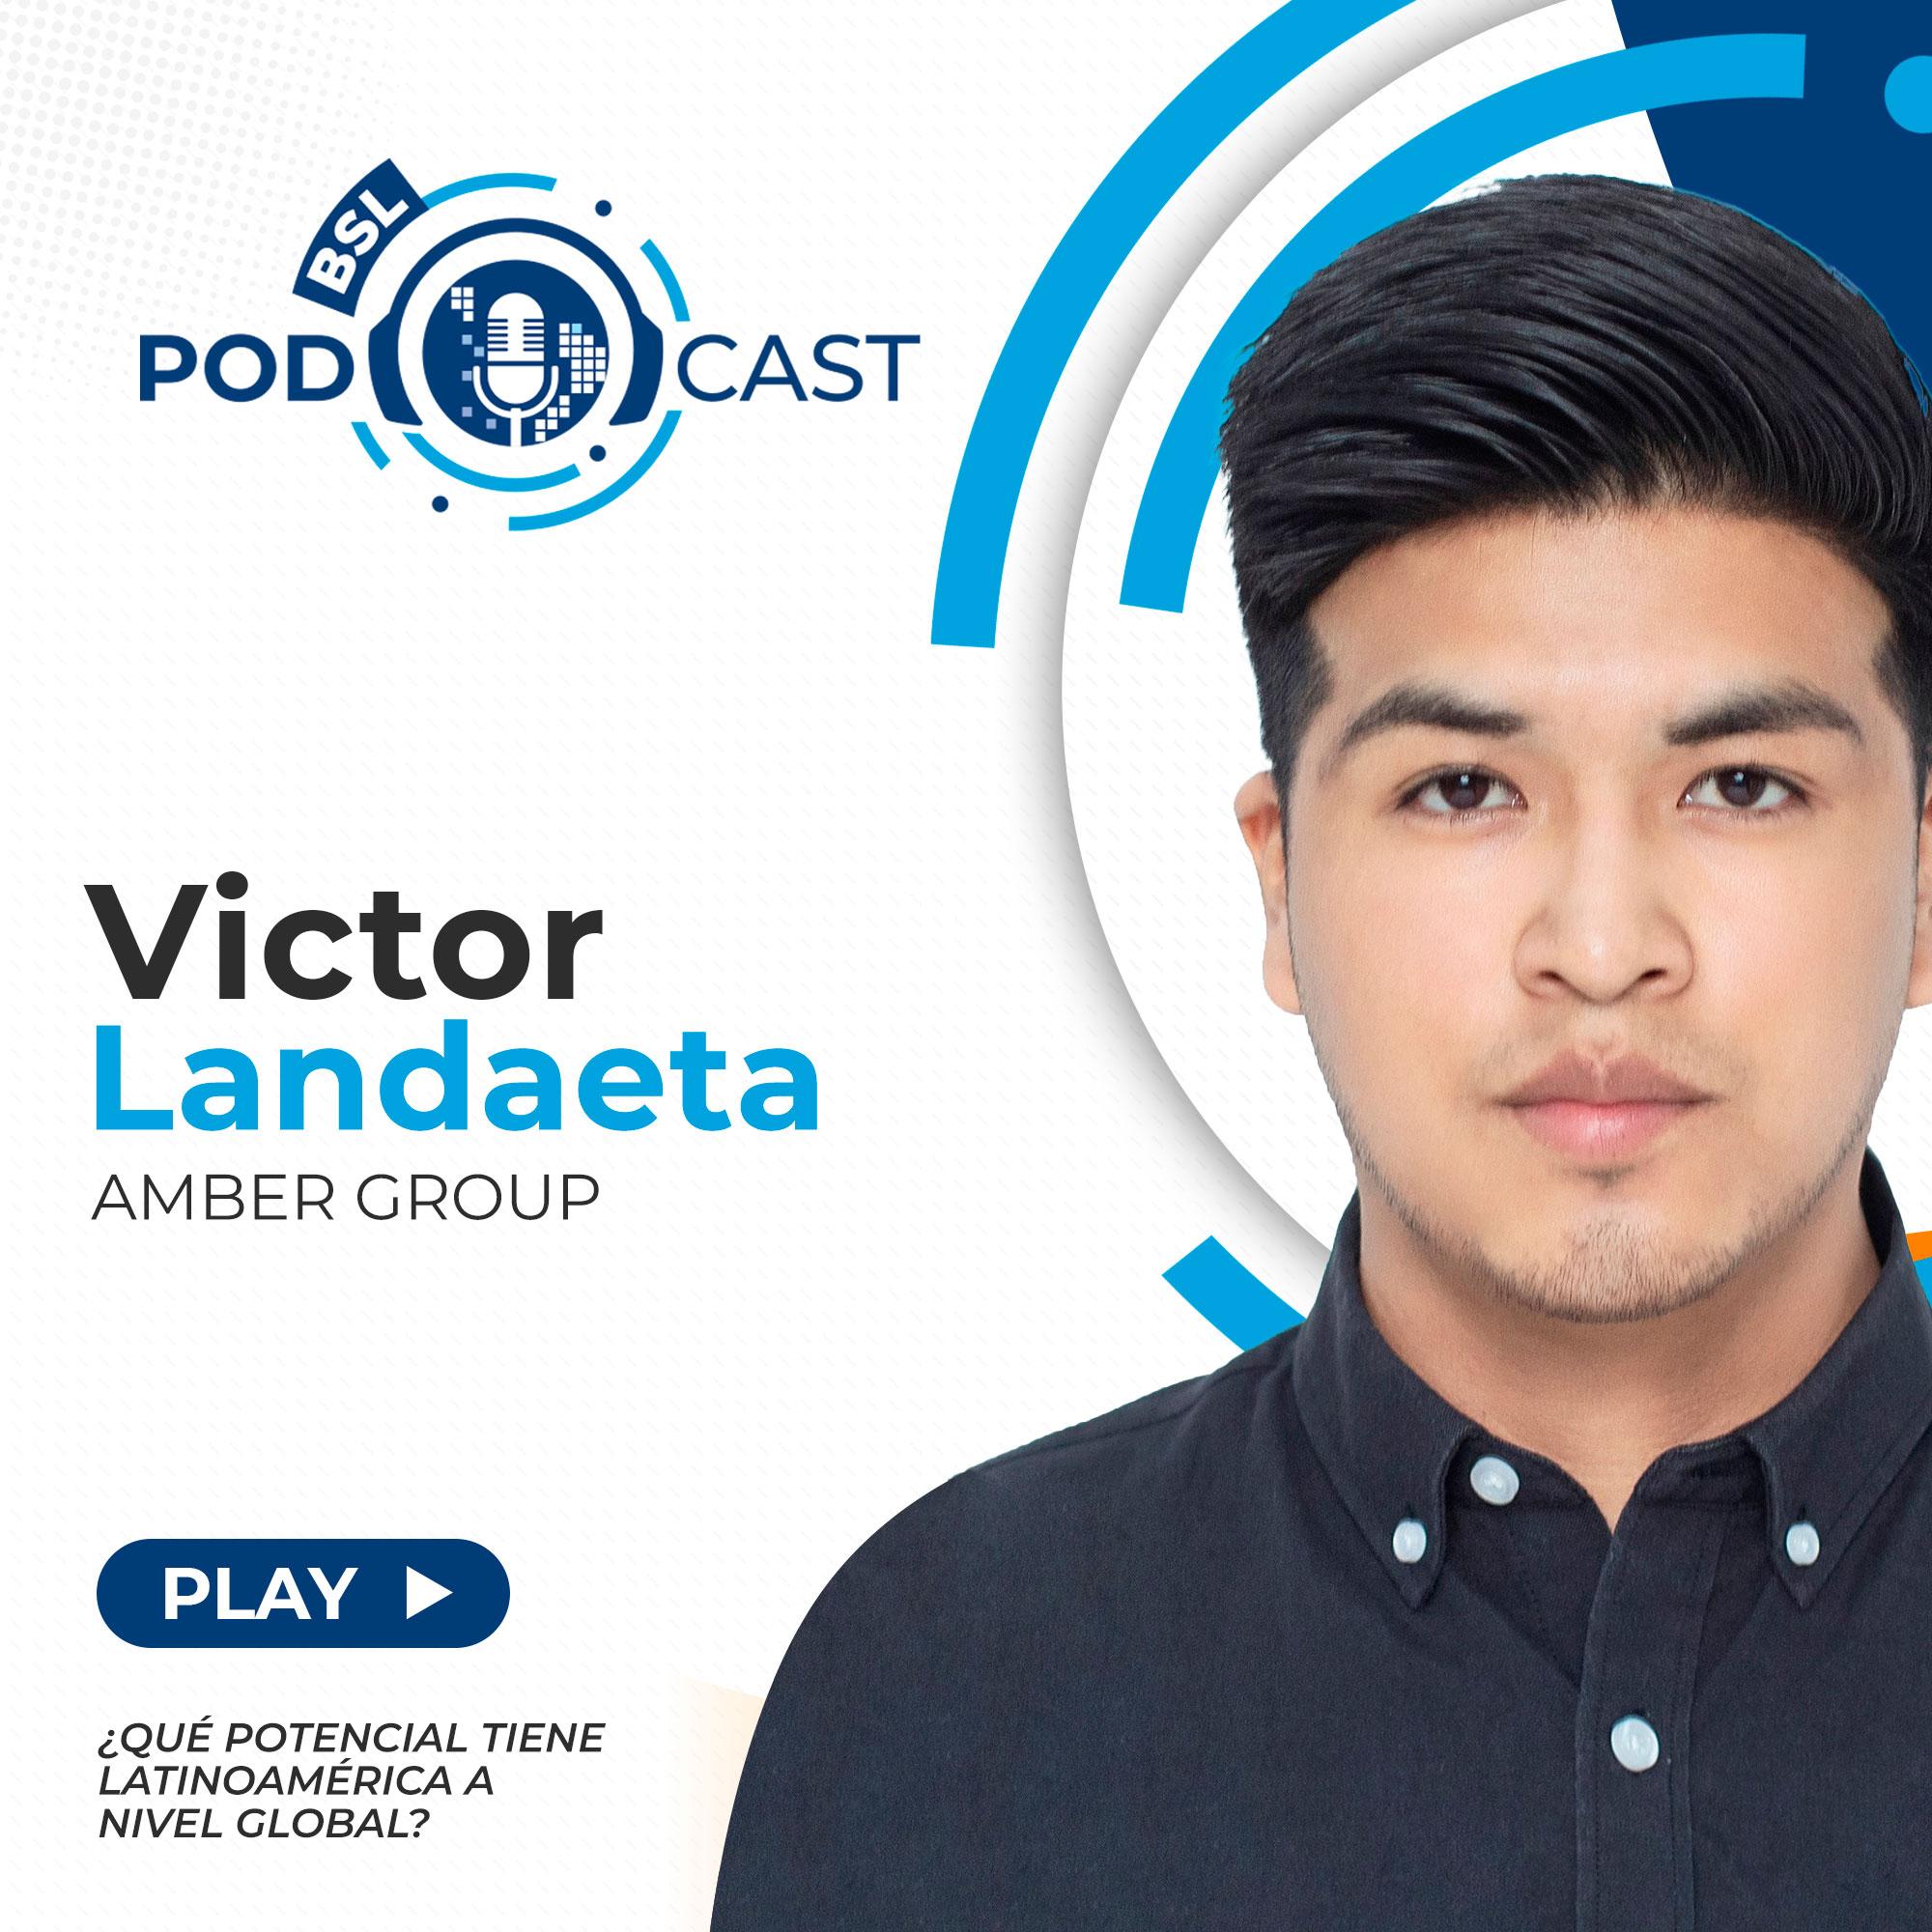 bsl podcast victor landaeta amber group